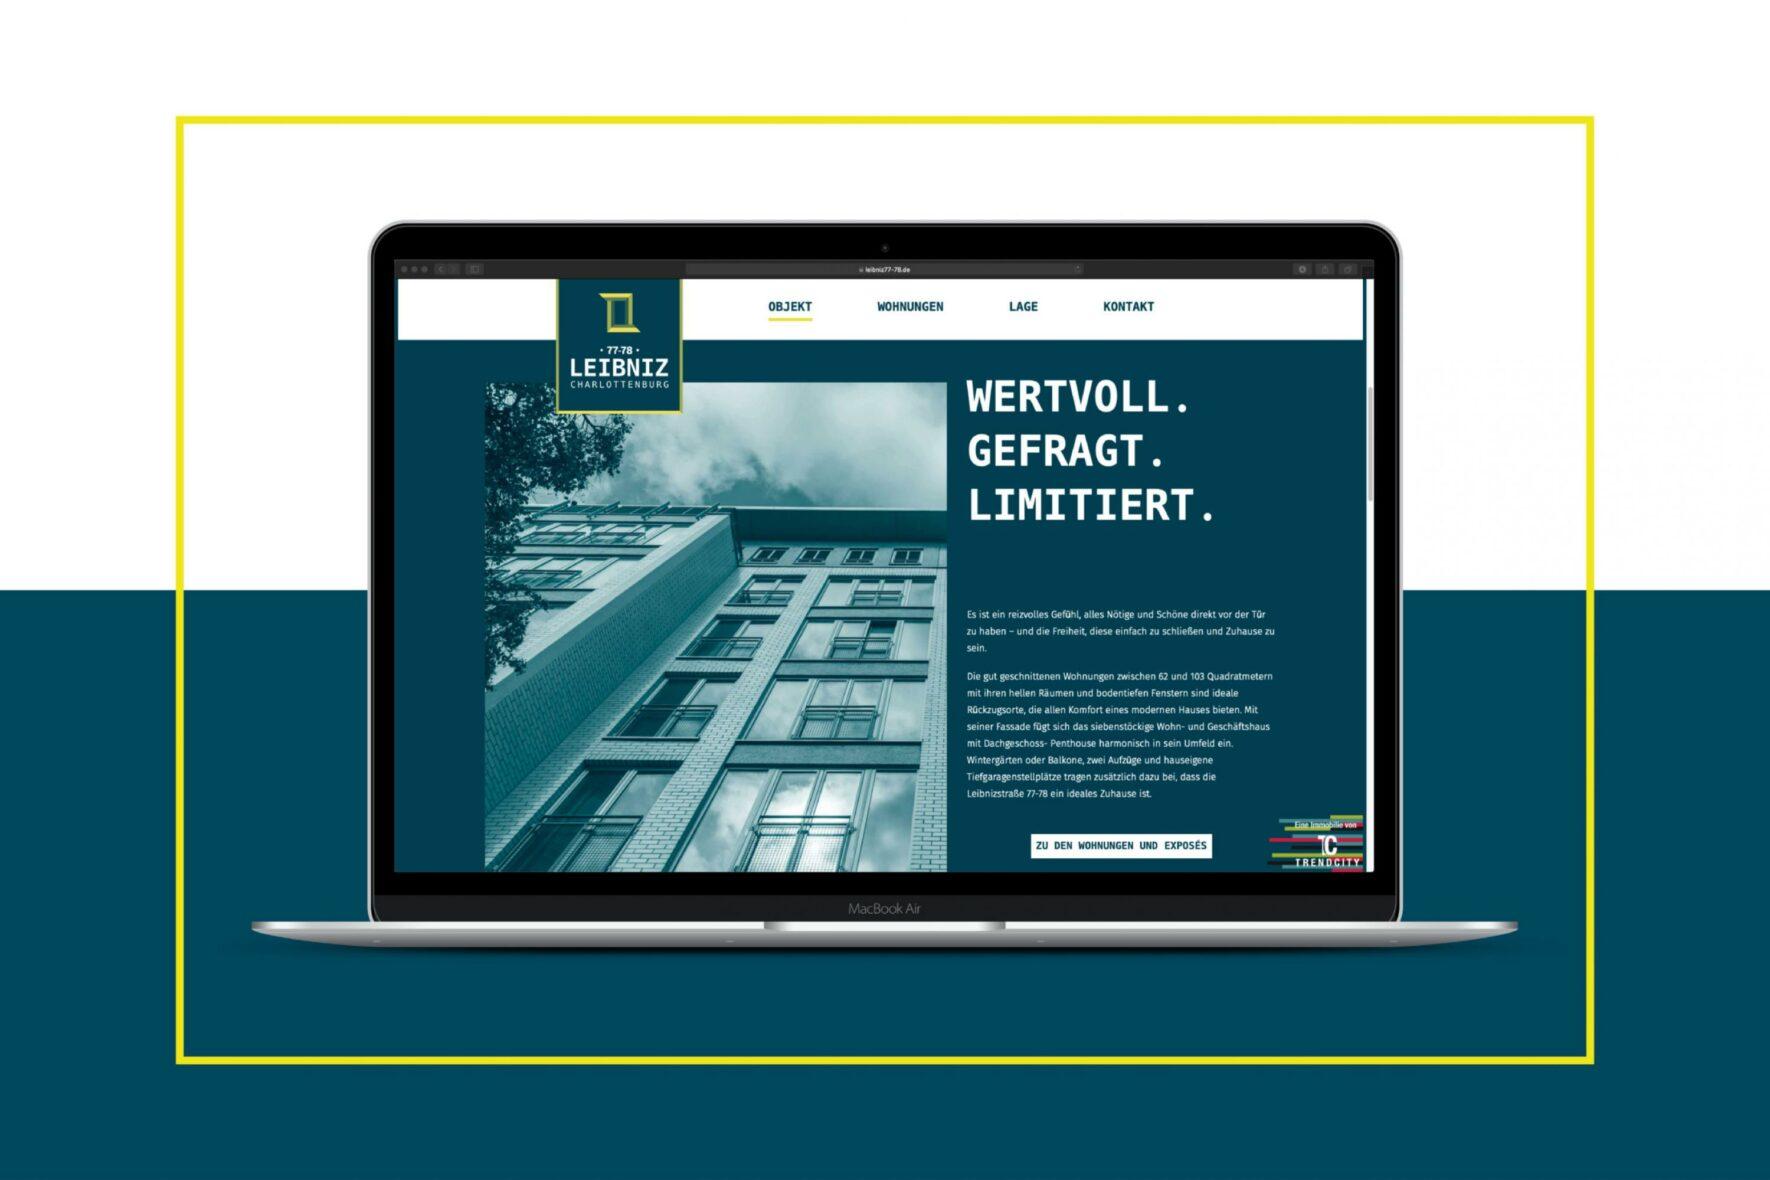 Webdesign-Leibnizstrasse-Trendcity-Immobilien-FORMLOS-Berlin-02